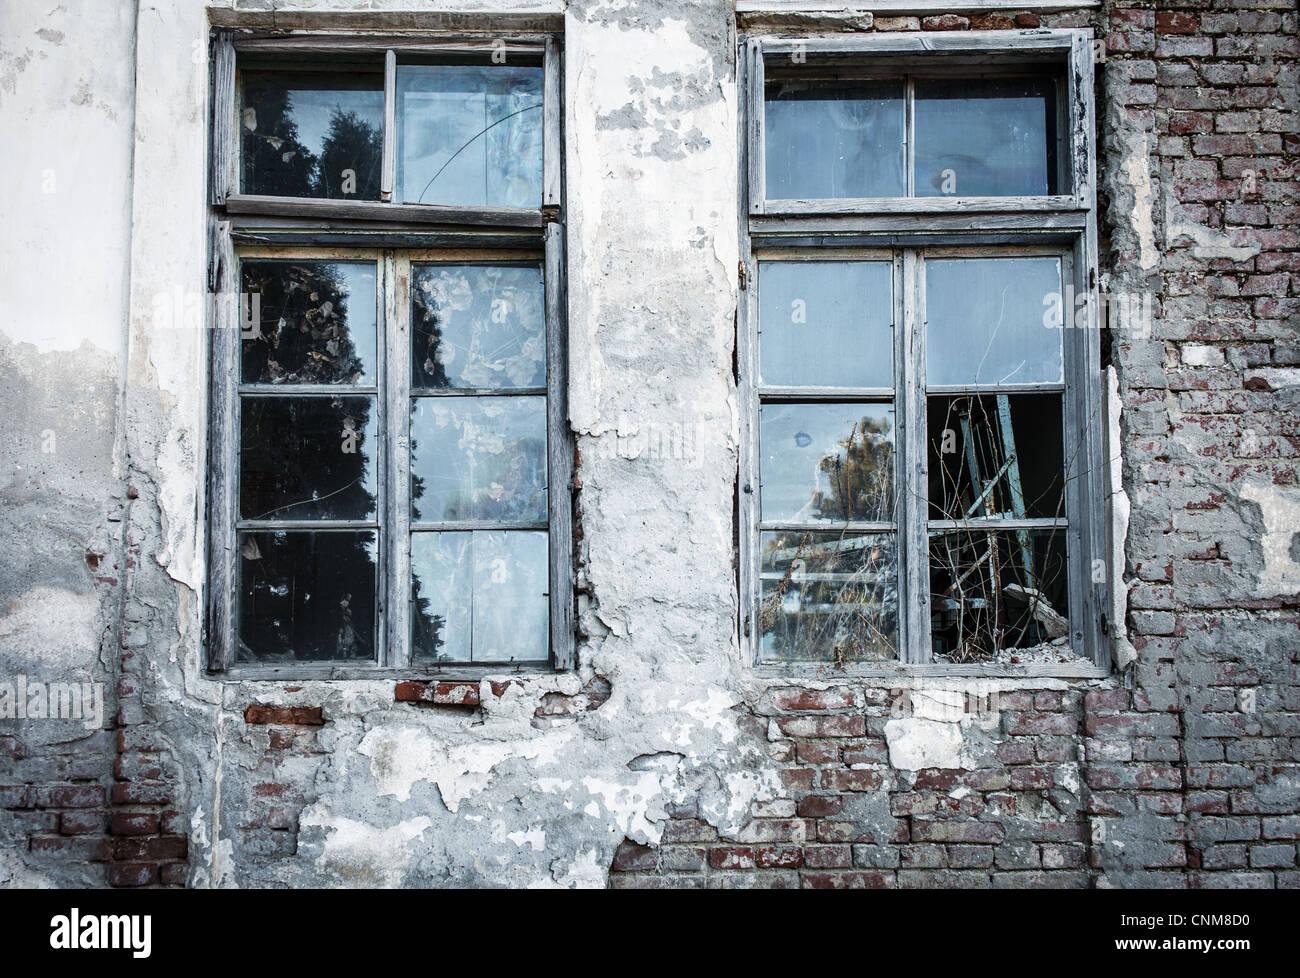 Broken window on an old decrepit building Stock Photo